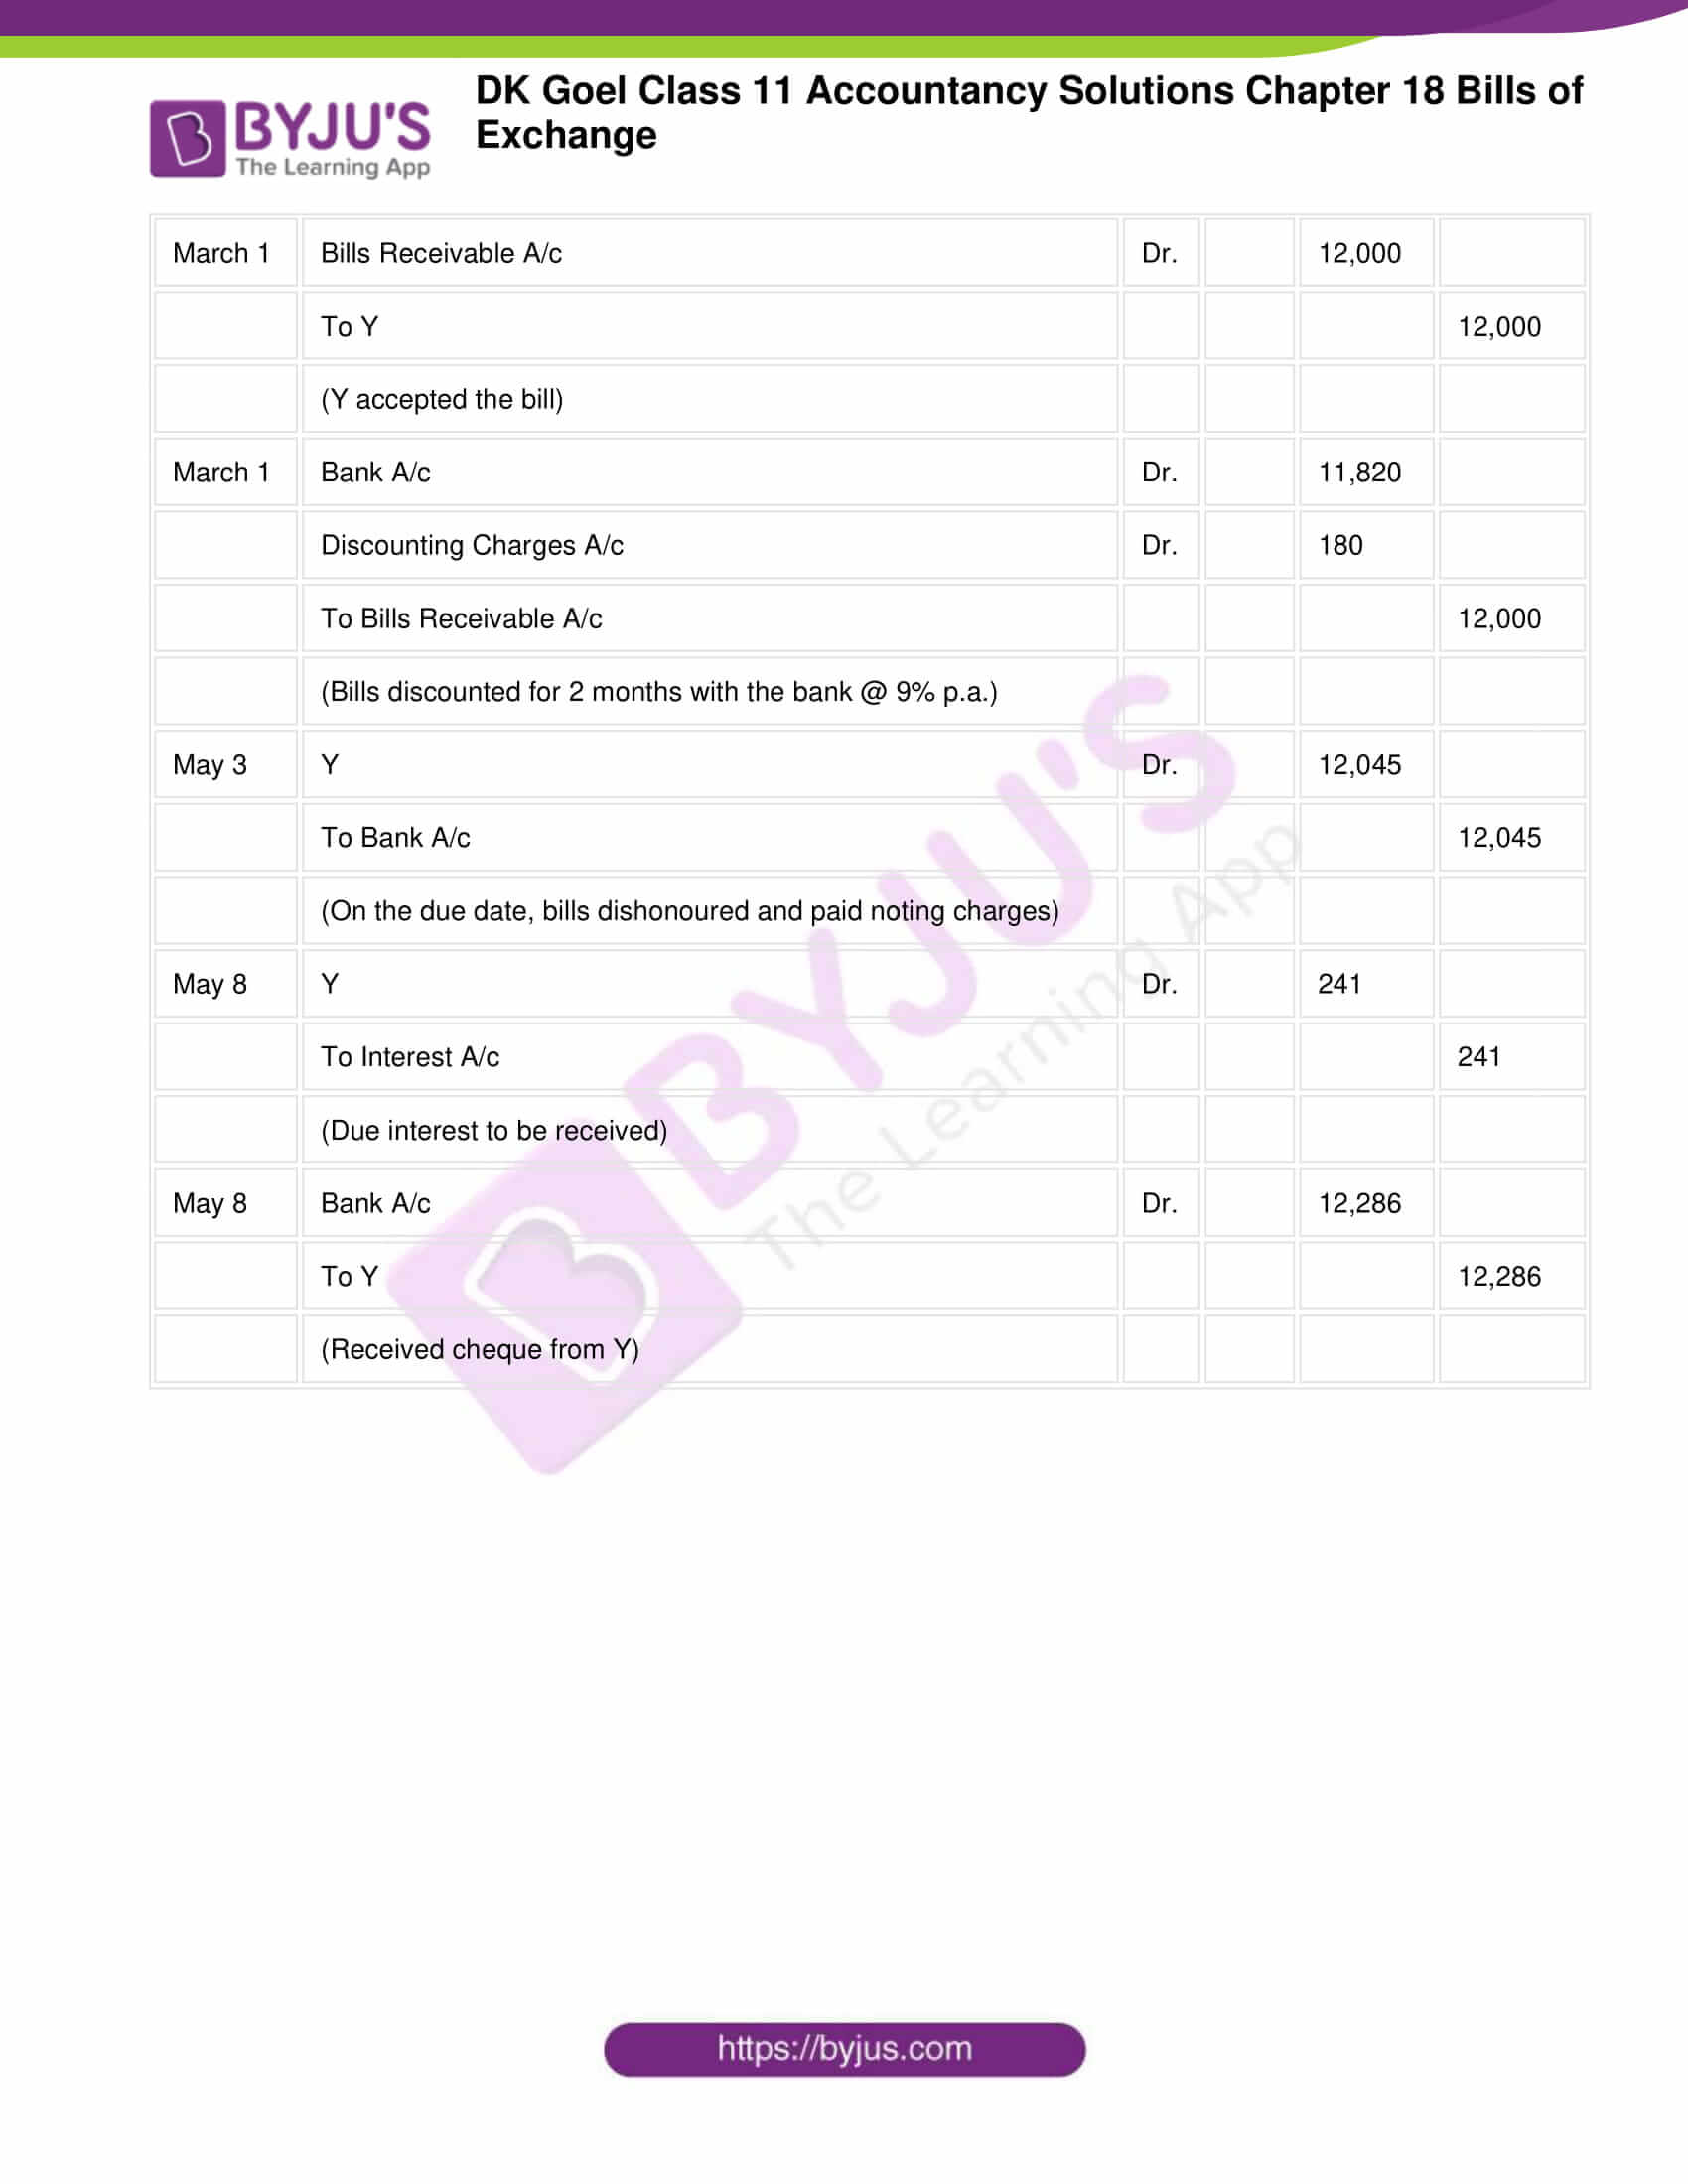 dk goel class 11 accountancy solutions chapter 18 094